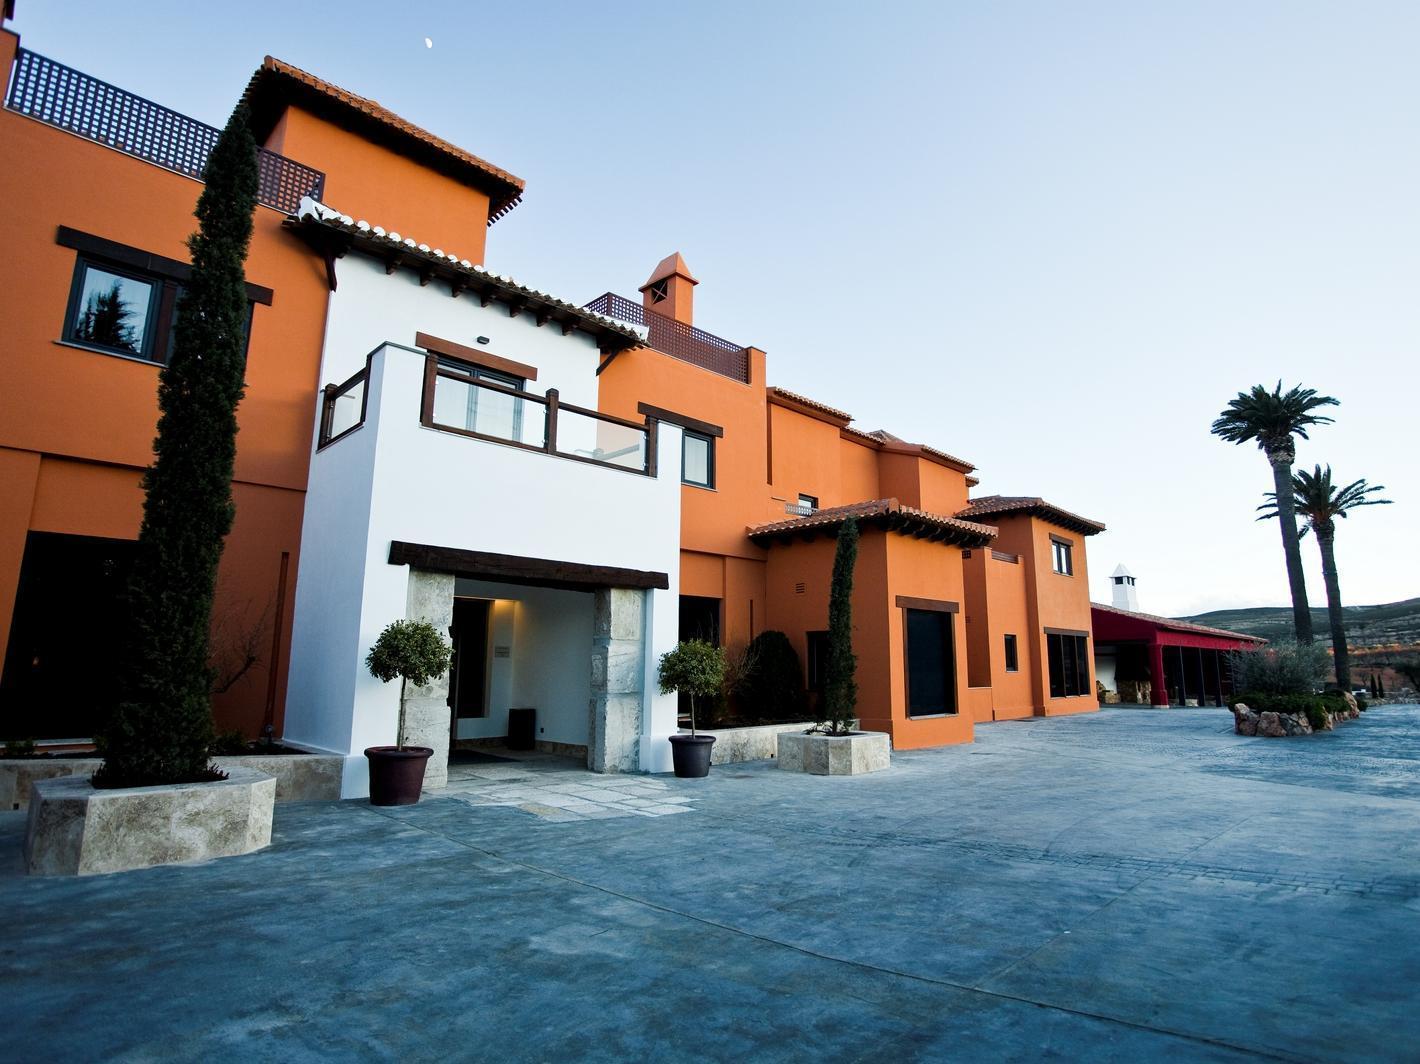 Hotel And Winery Se�or�o De Nevada